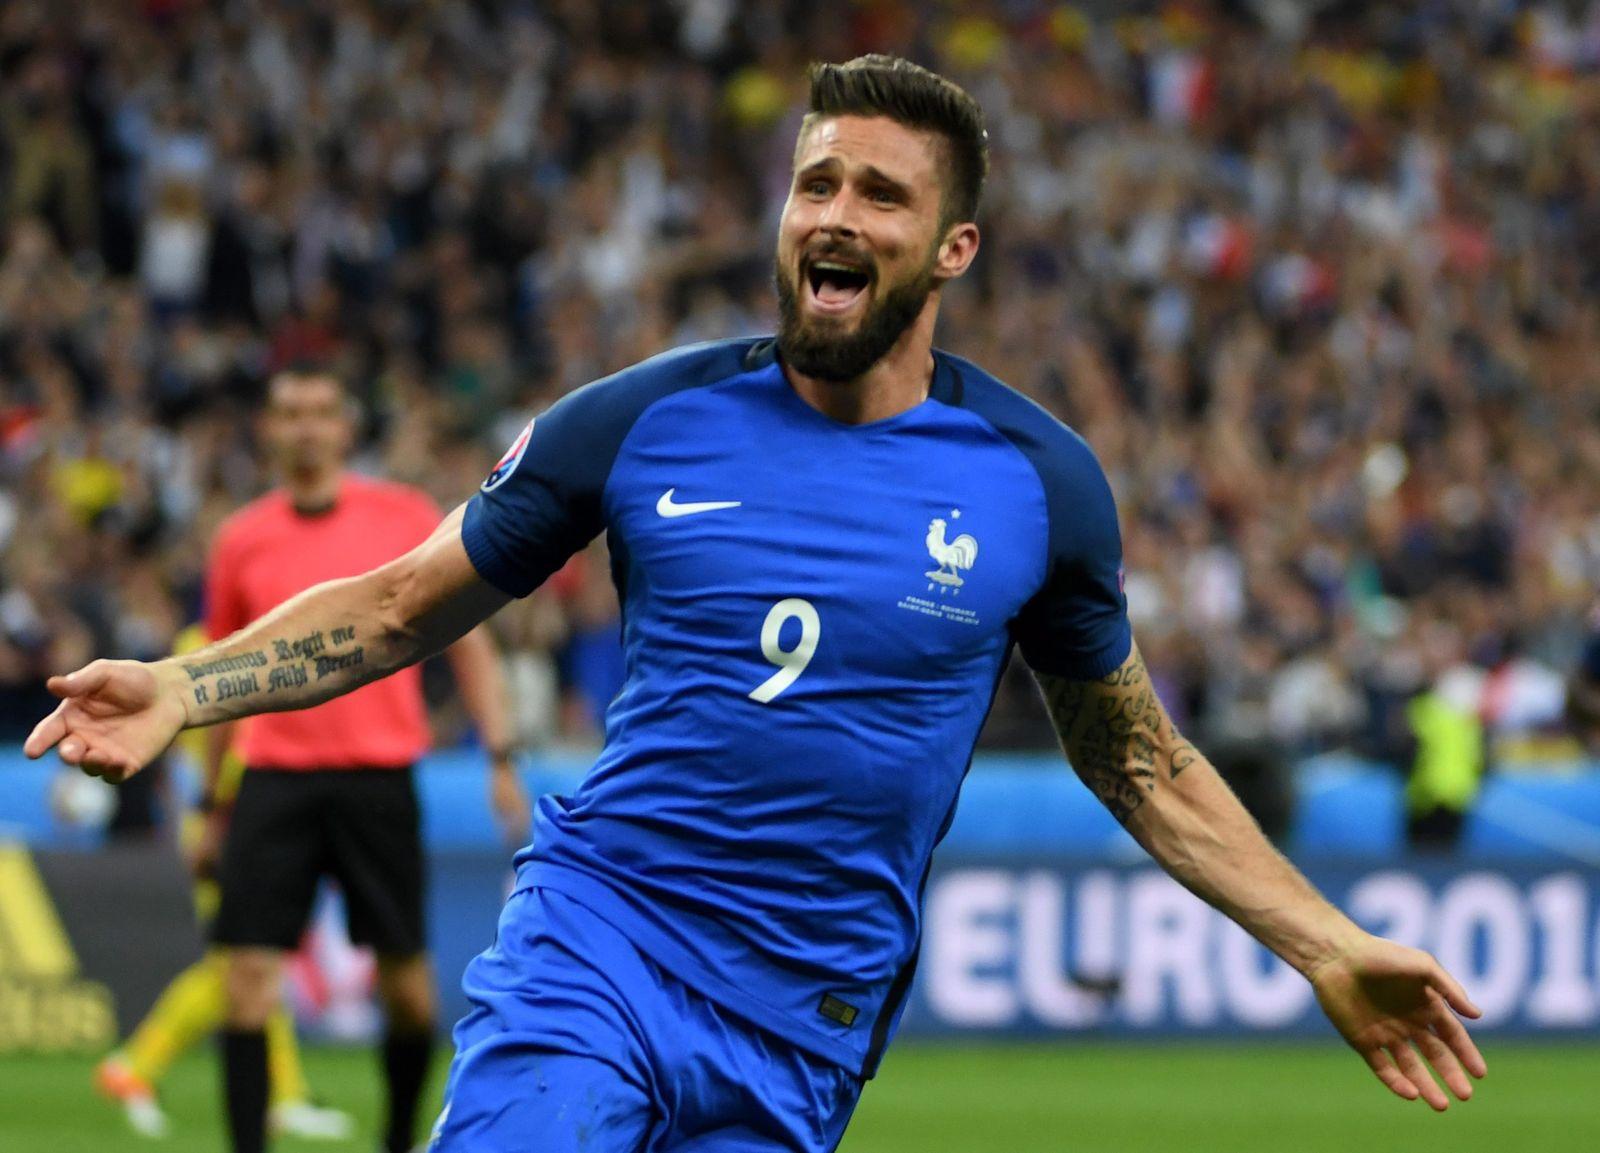 EURO 2016 - Group A France vs Romania